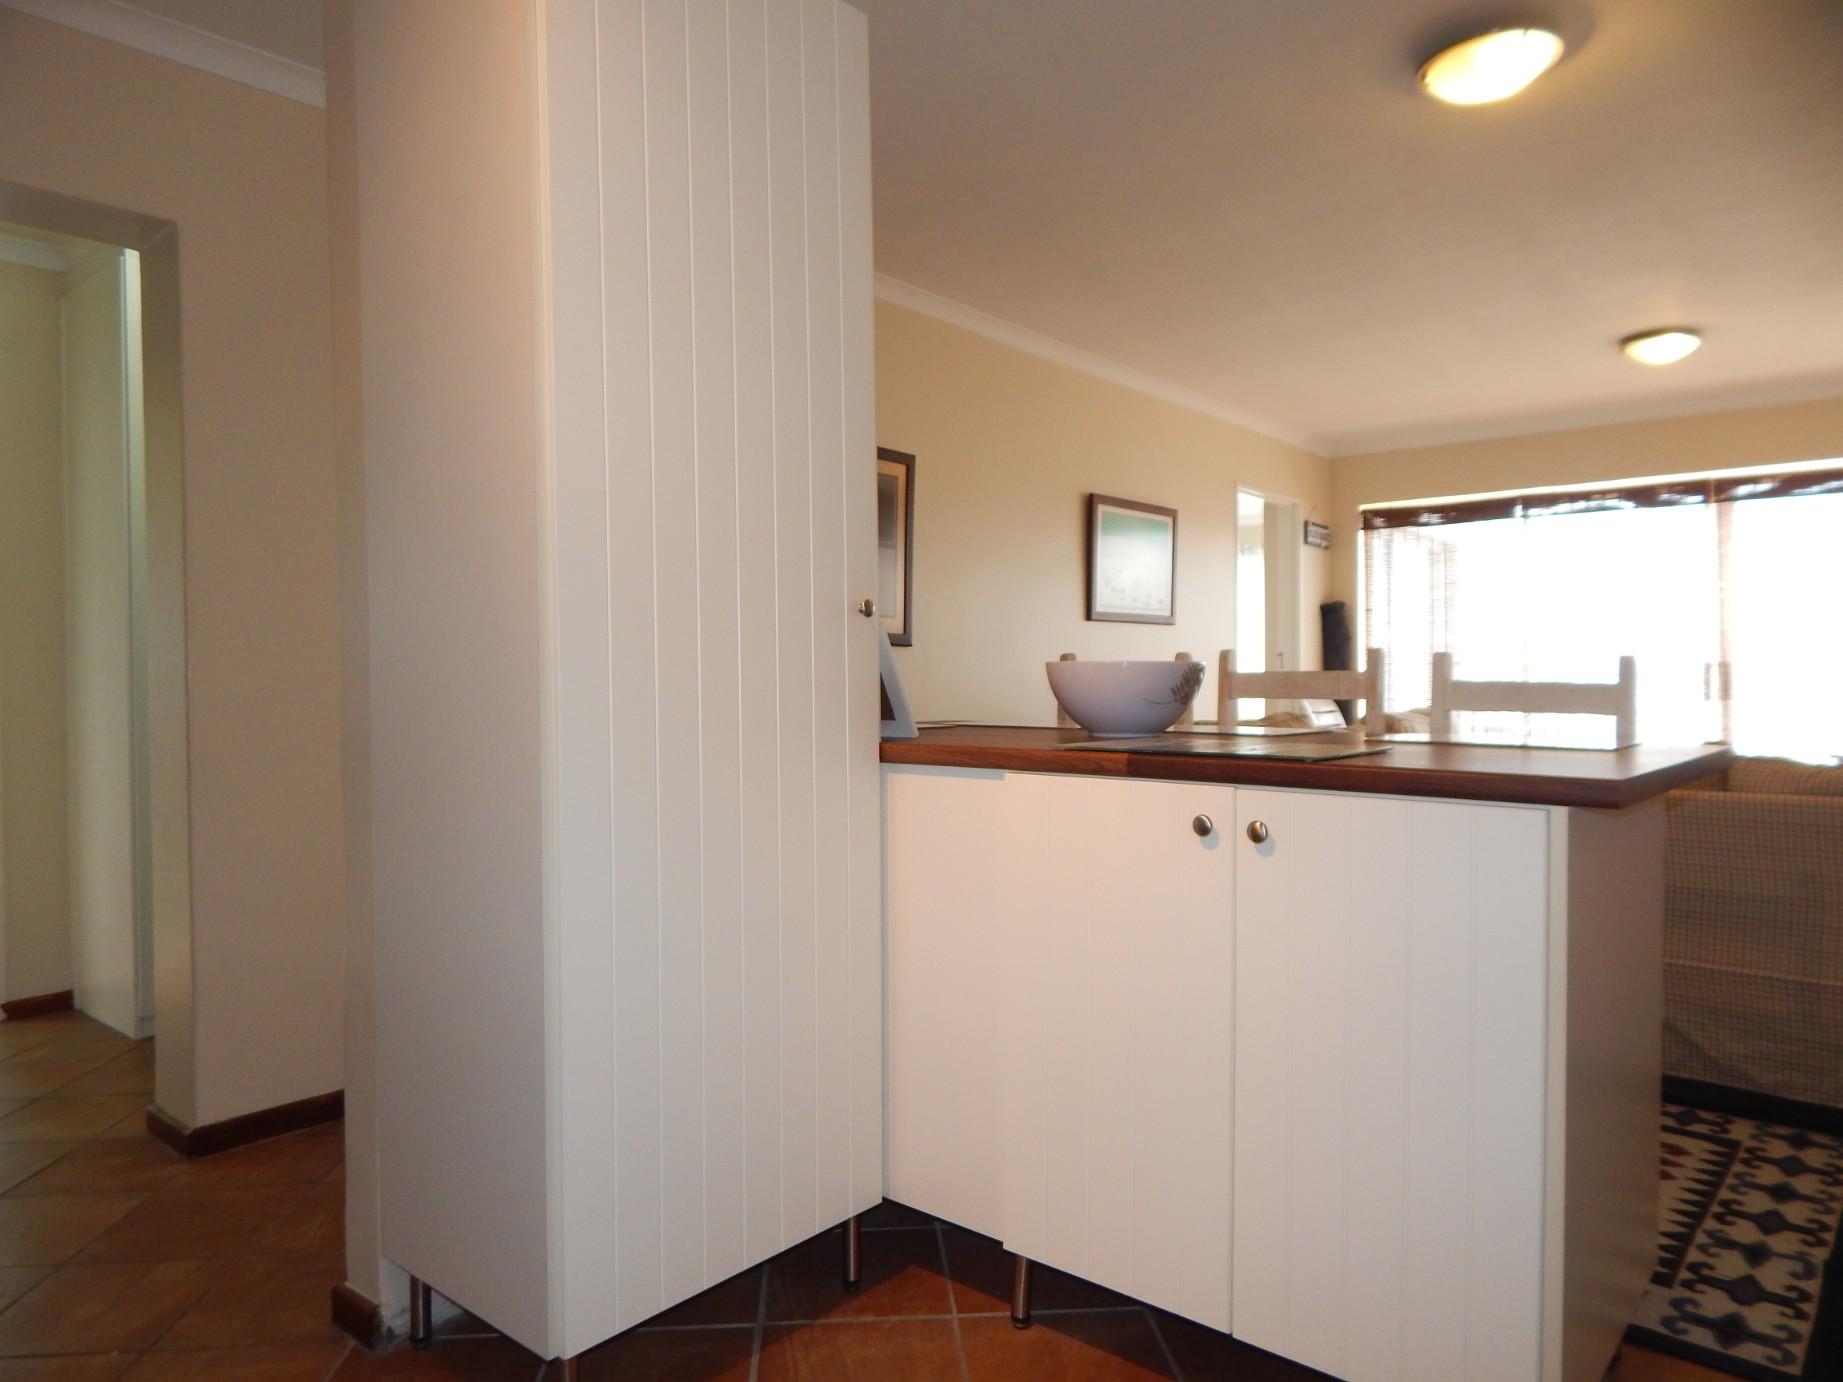 3 Bedroom Apartment for sale in De Bakke ENT0066483 : photo#11